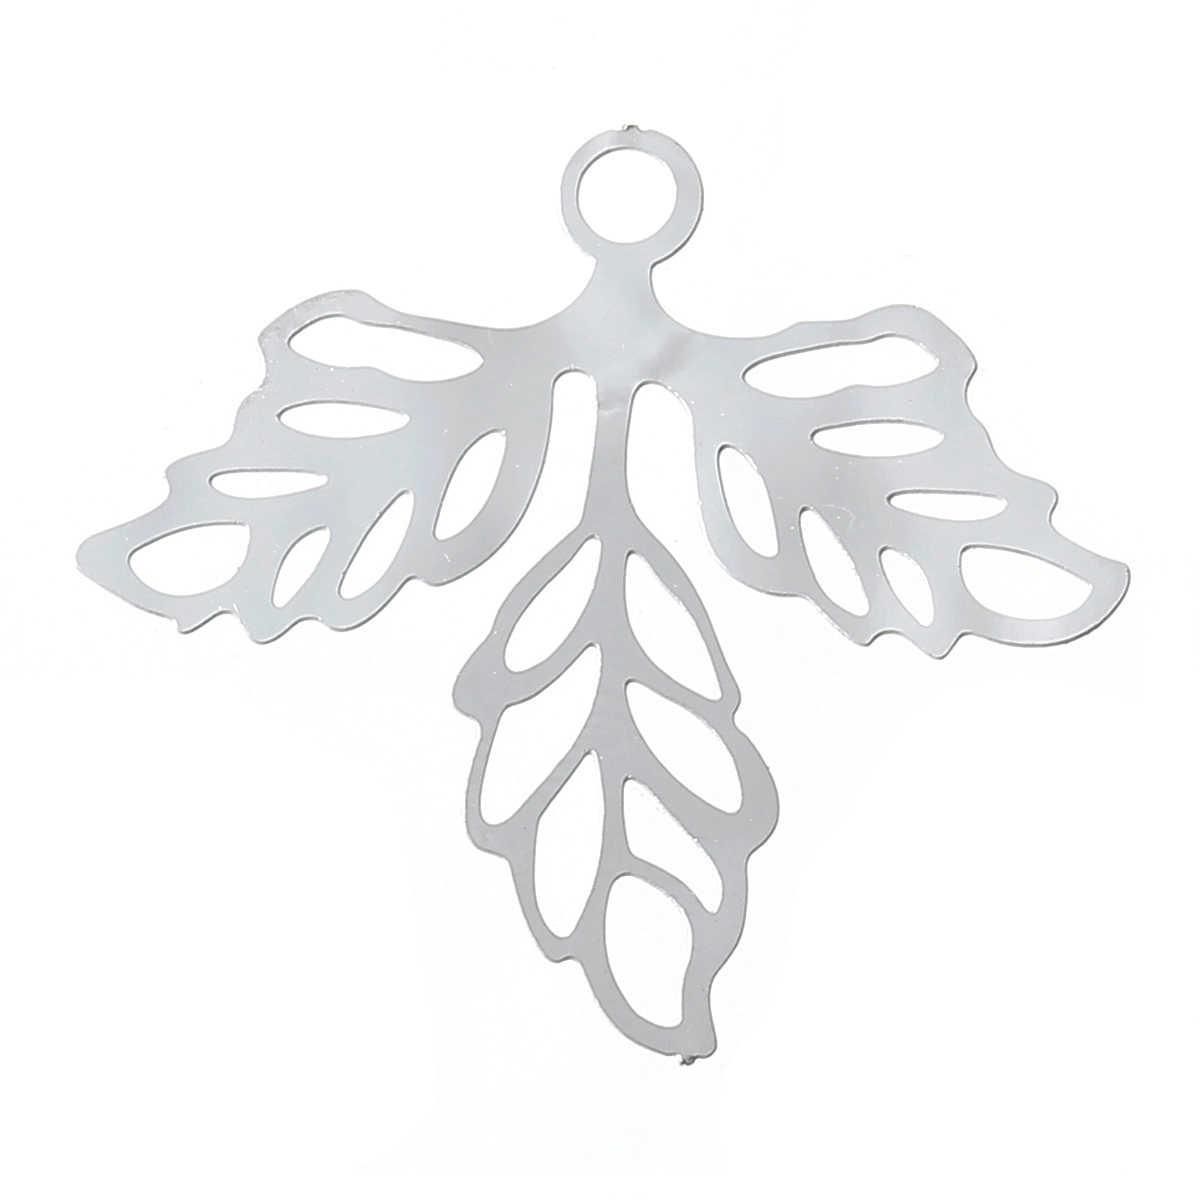 "DoreenBeads Filigree สแตนเลสจี้ Leaf Silver Tone Hollow 25 มม.(1 "") x 23 มม.(7/8 ""),2 ชิ้น 2017 ใหม่"